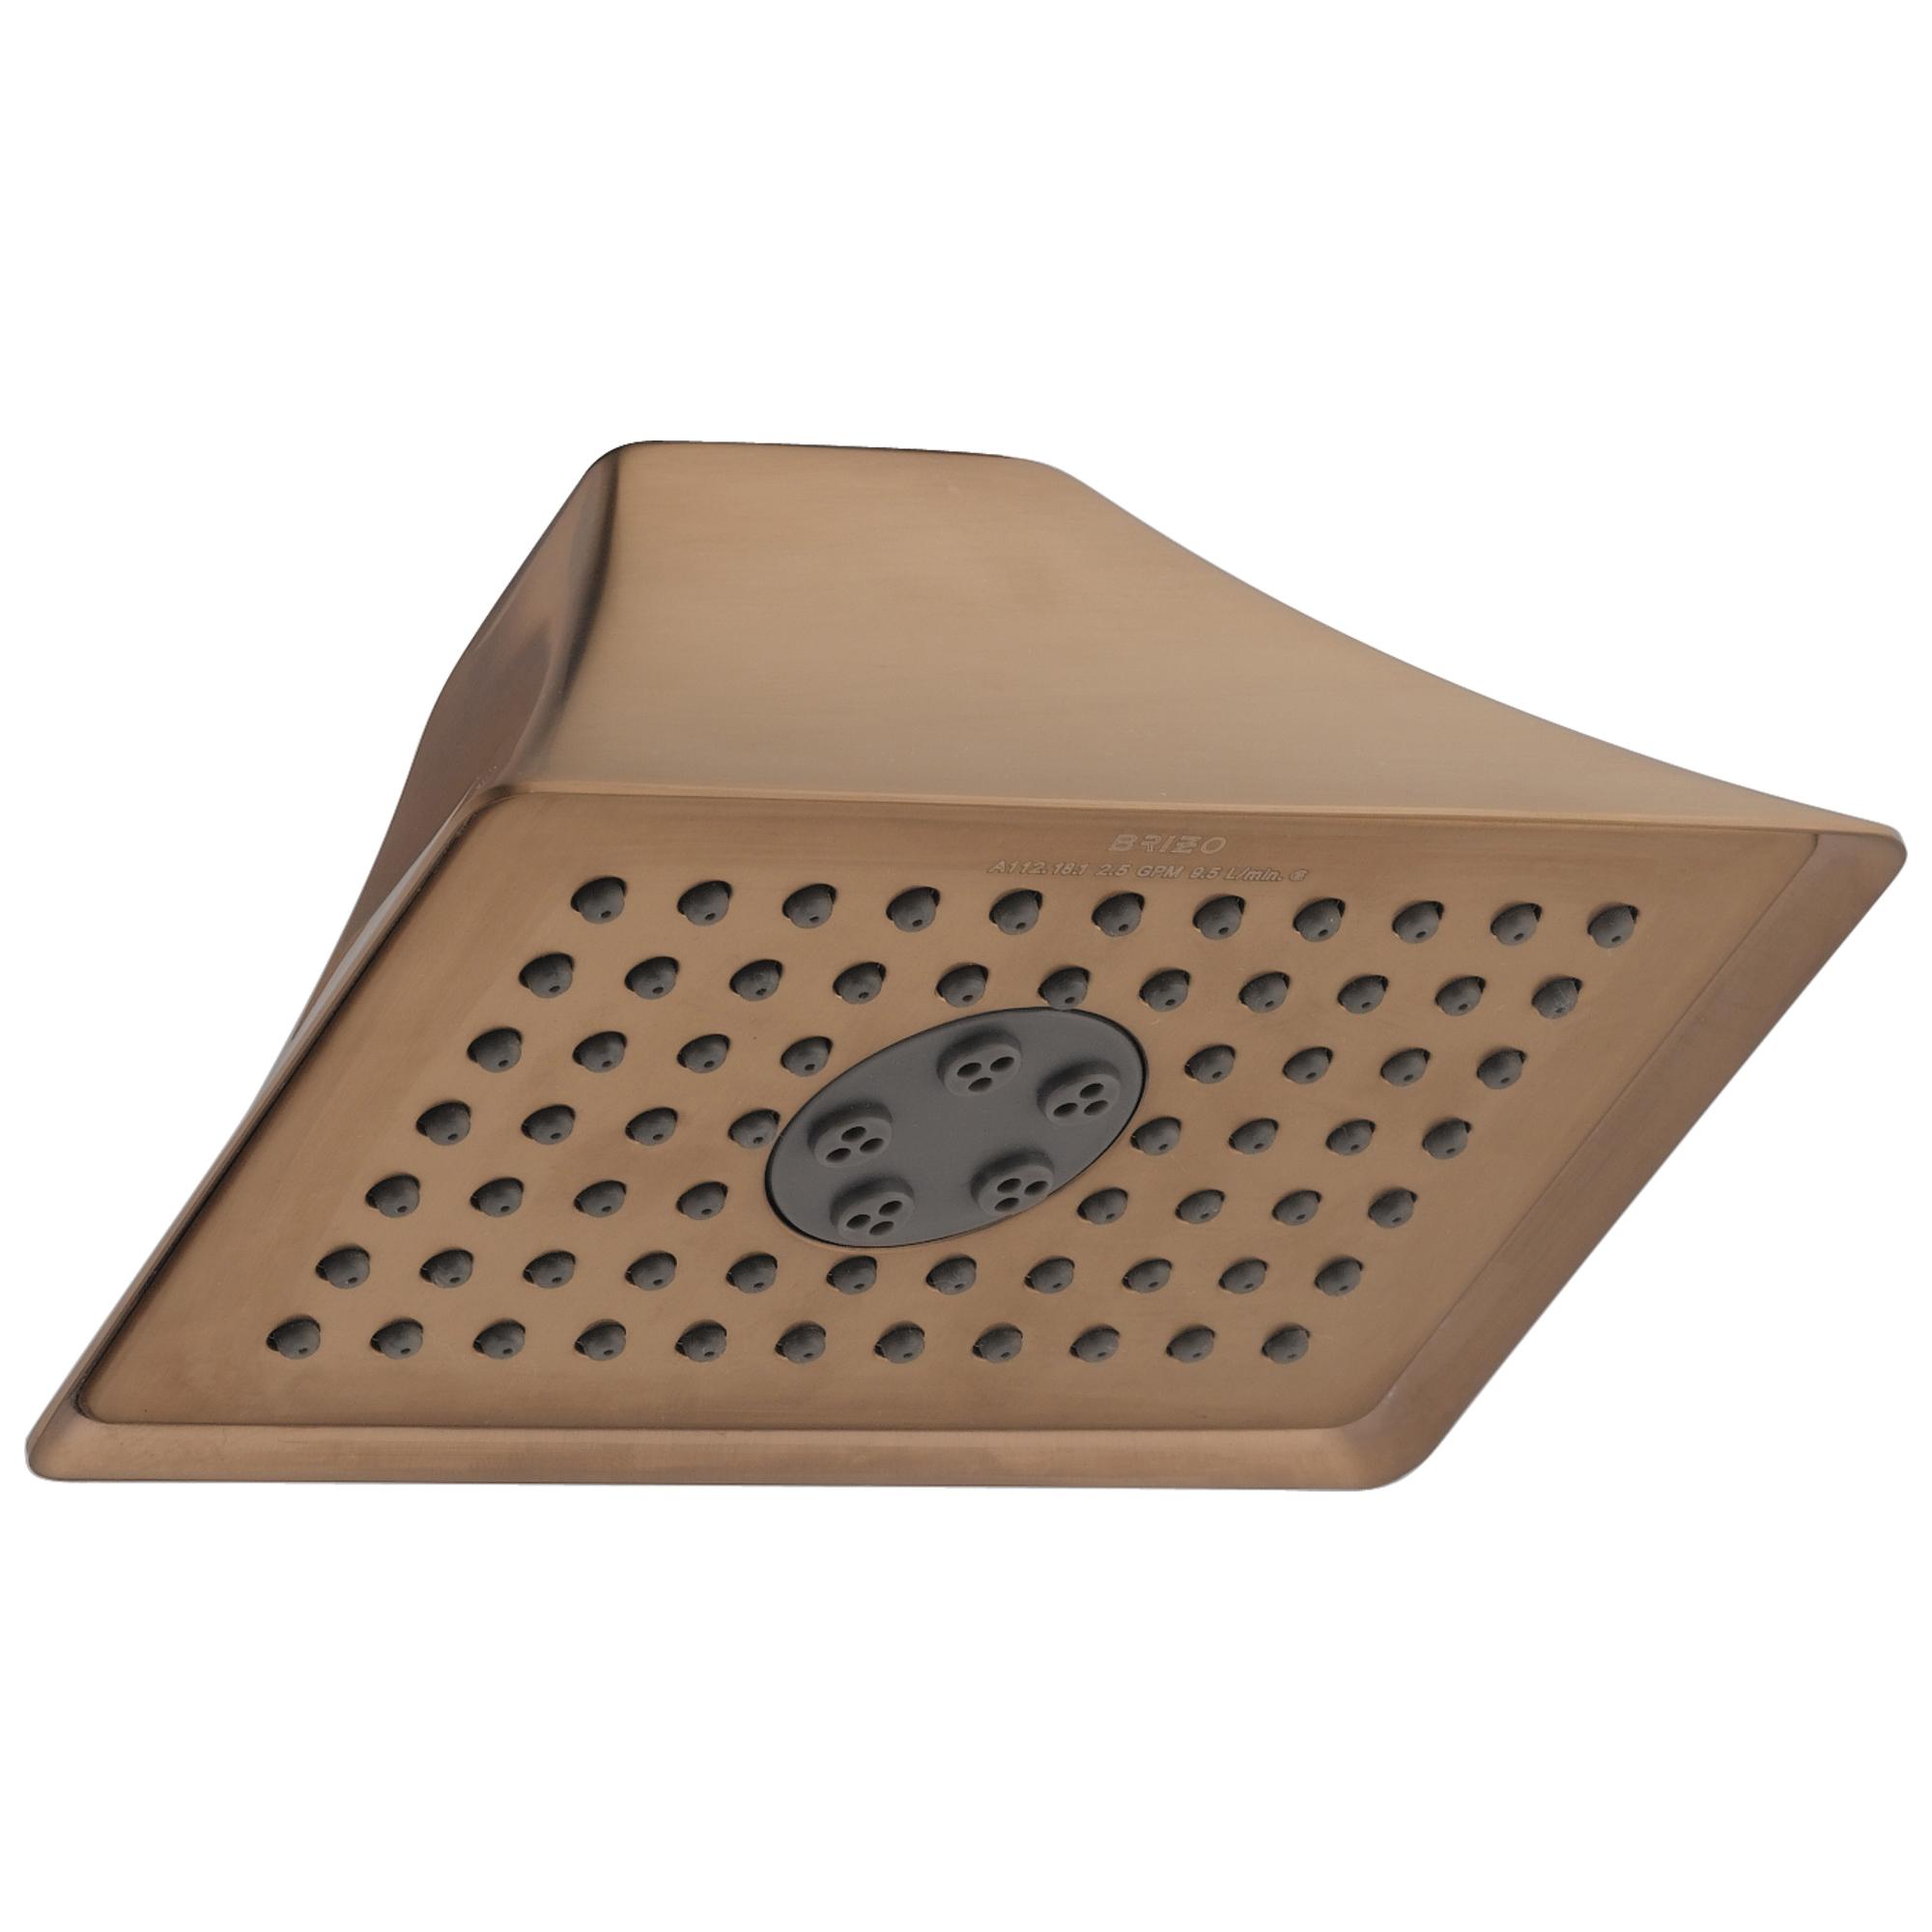 Brizo® RP48041BZ 2-Function Shower Head, RSVP®, 2.5 gpm, 2 Sprays, Wall Mount, Import